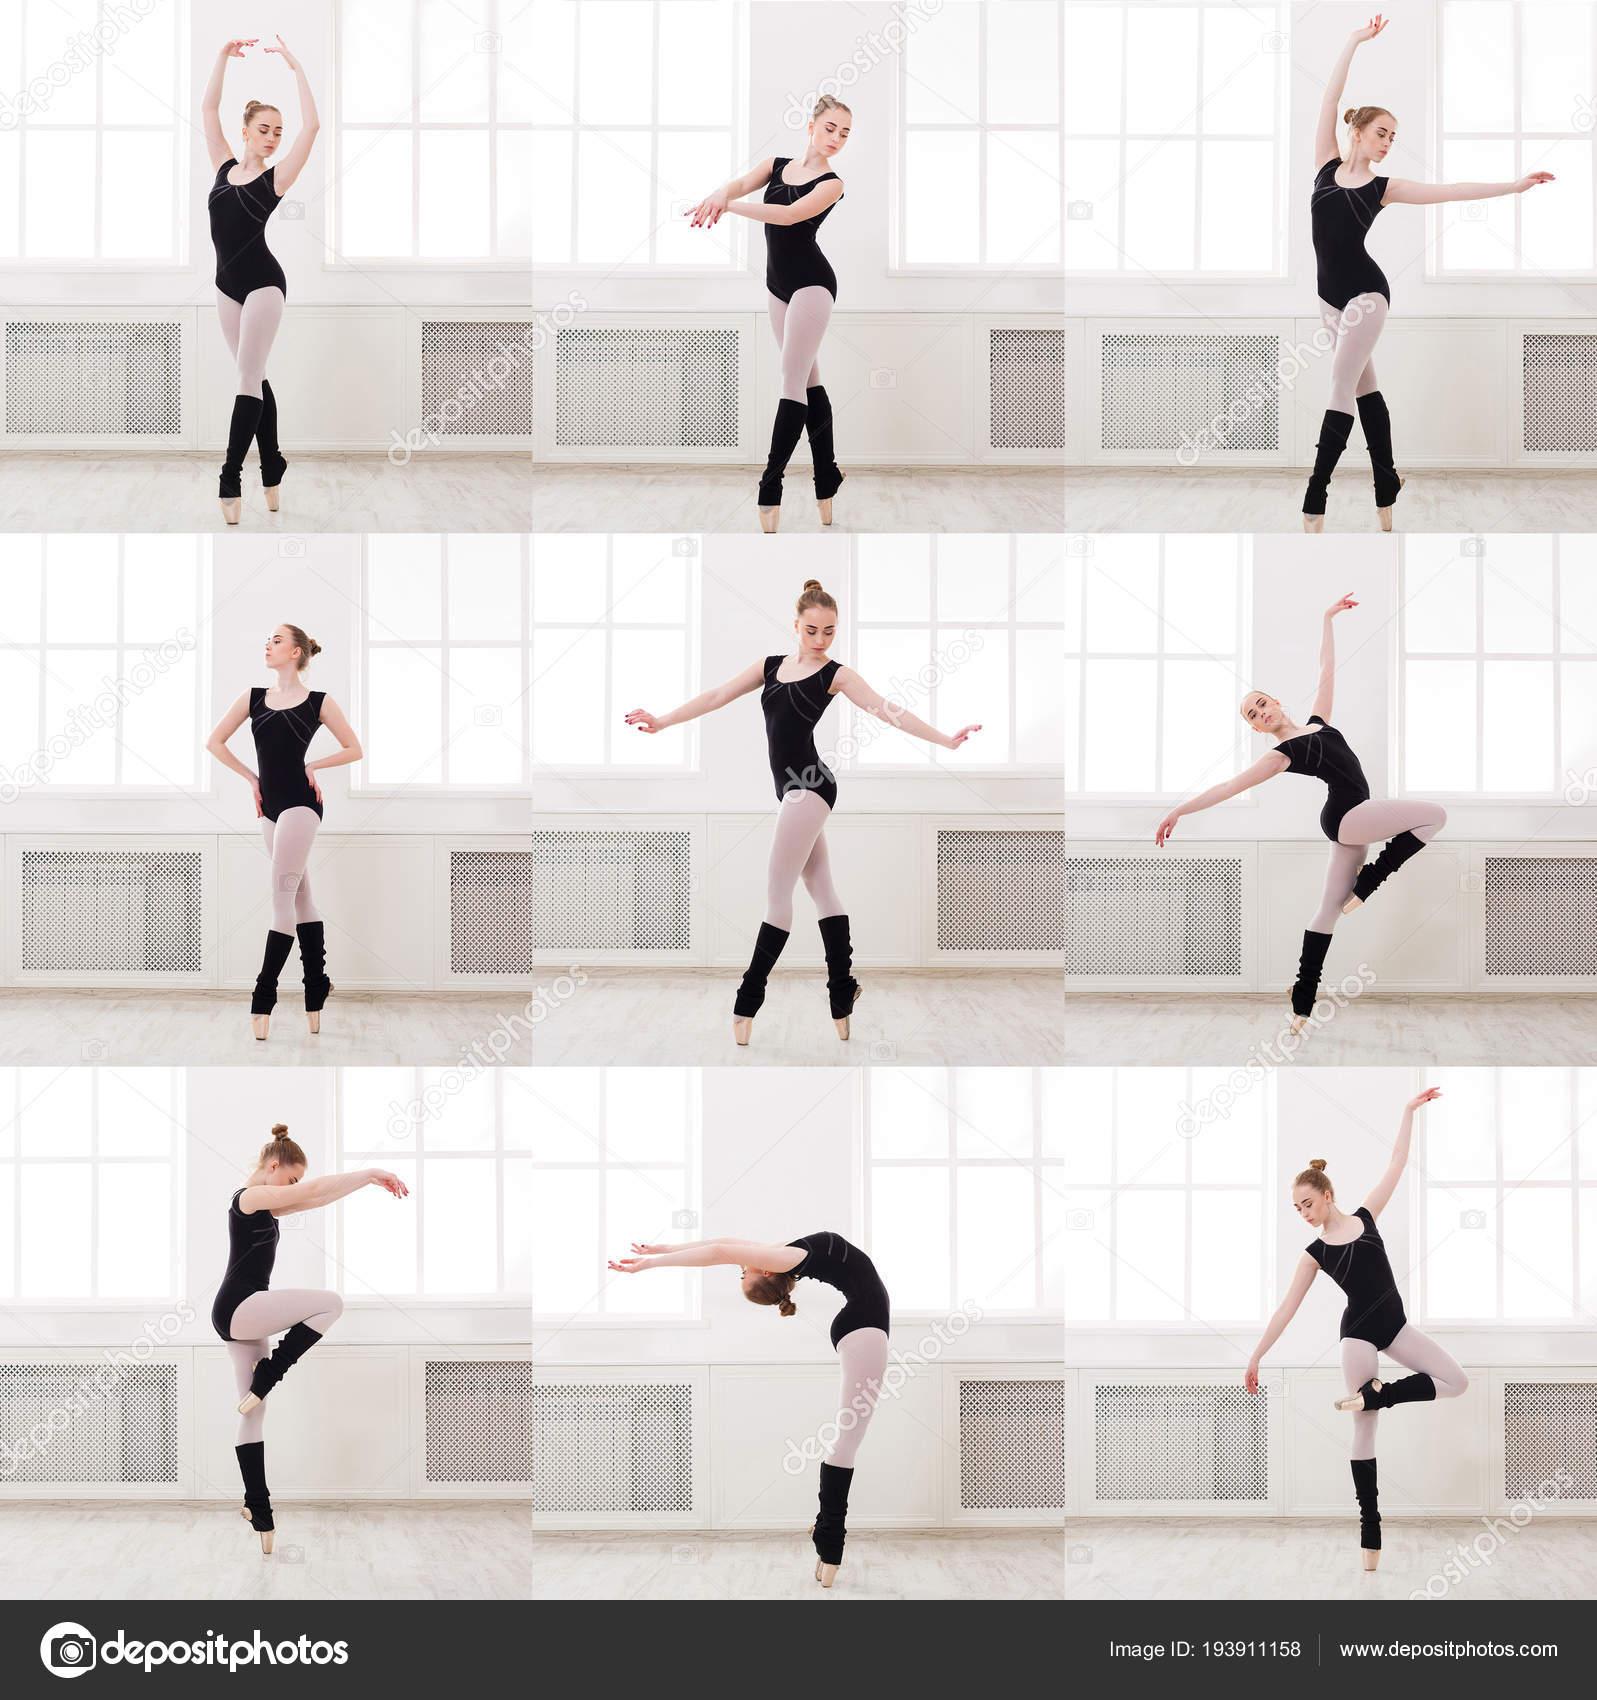 Set Of Young Ballerina Standing In Ballet Poses Stock Photo C Milkos 193911158